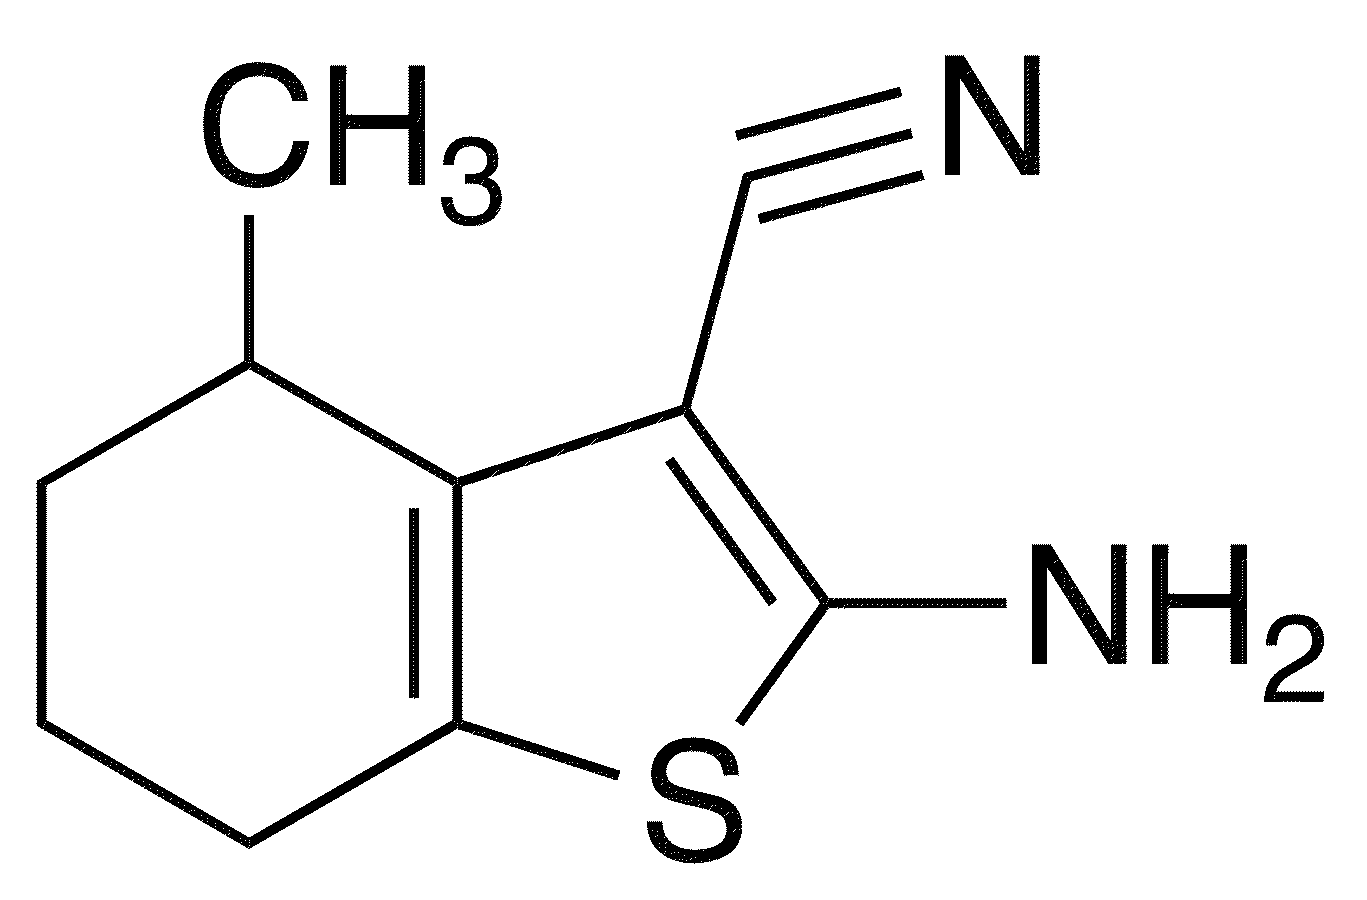 2-Amino-4-methyl-4,5,6,7-tetrahydro-1-benzothiophene-3-carbonitrile